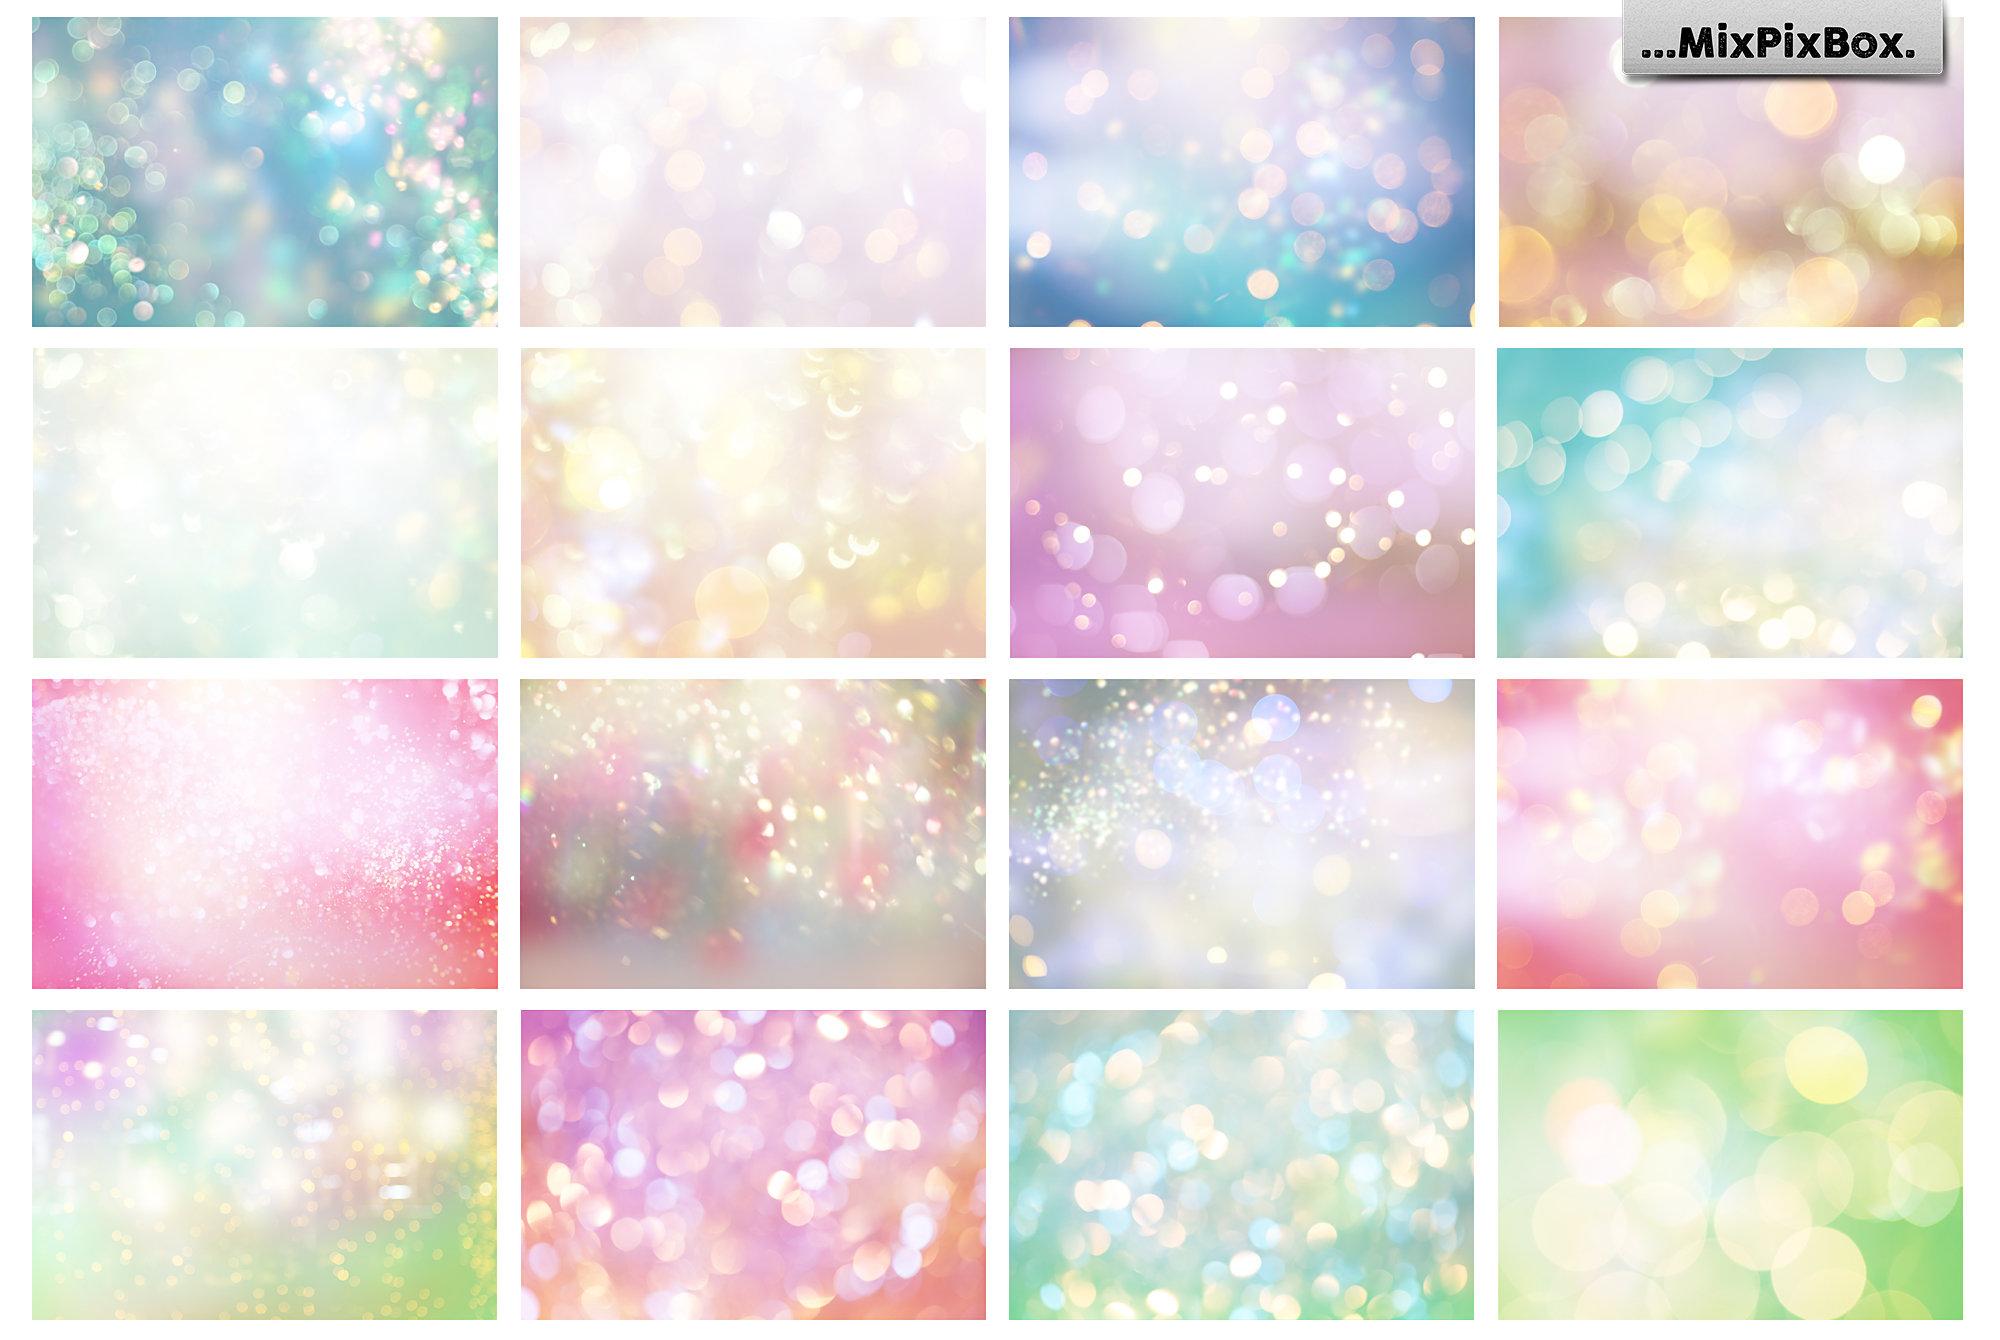 pastel digital backdrops with bokeh